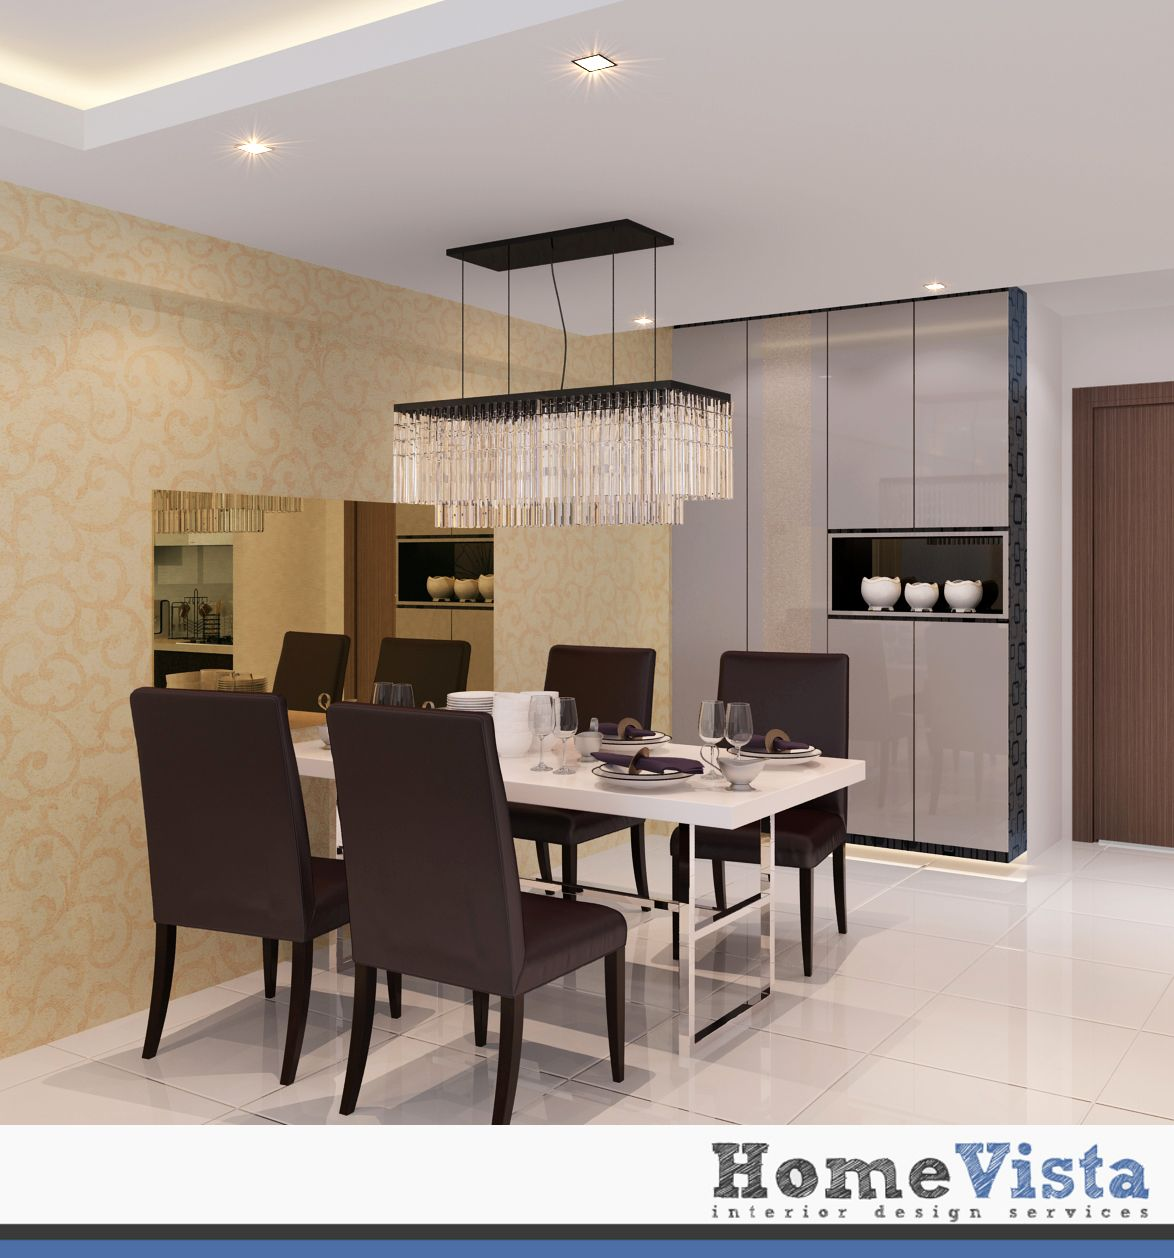 4 room bto interior design for hdb 4 room flat for 4 room hdb bto interior design ideas